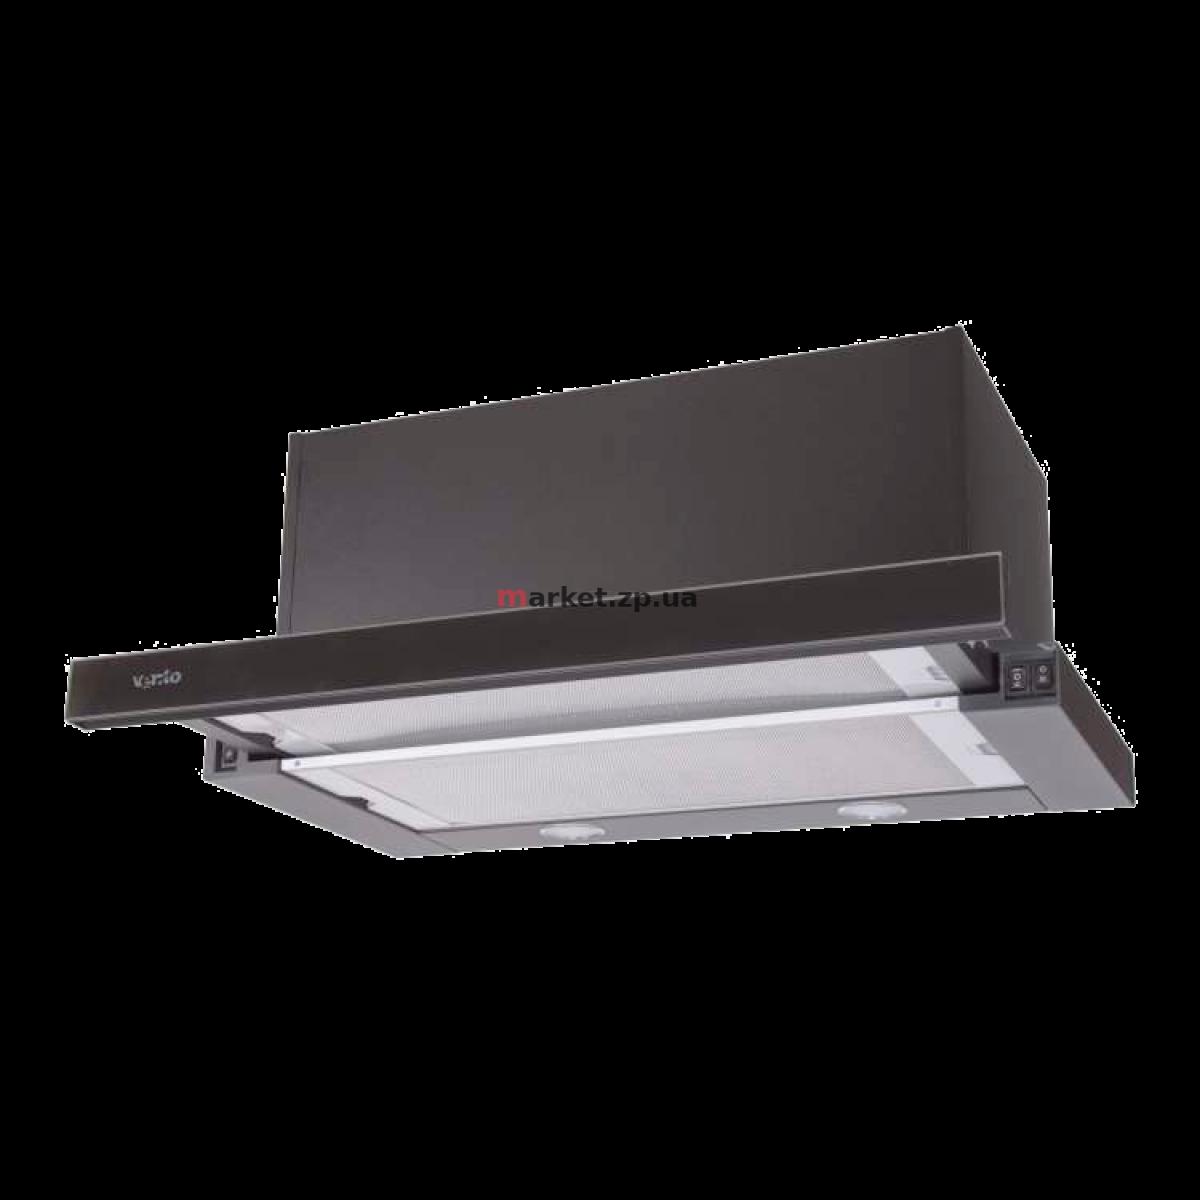 Вытяжка VENTOLUX GARDA 60 BK/BG (1100) SMD LED